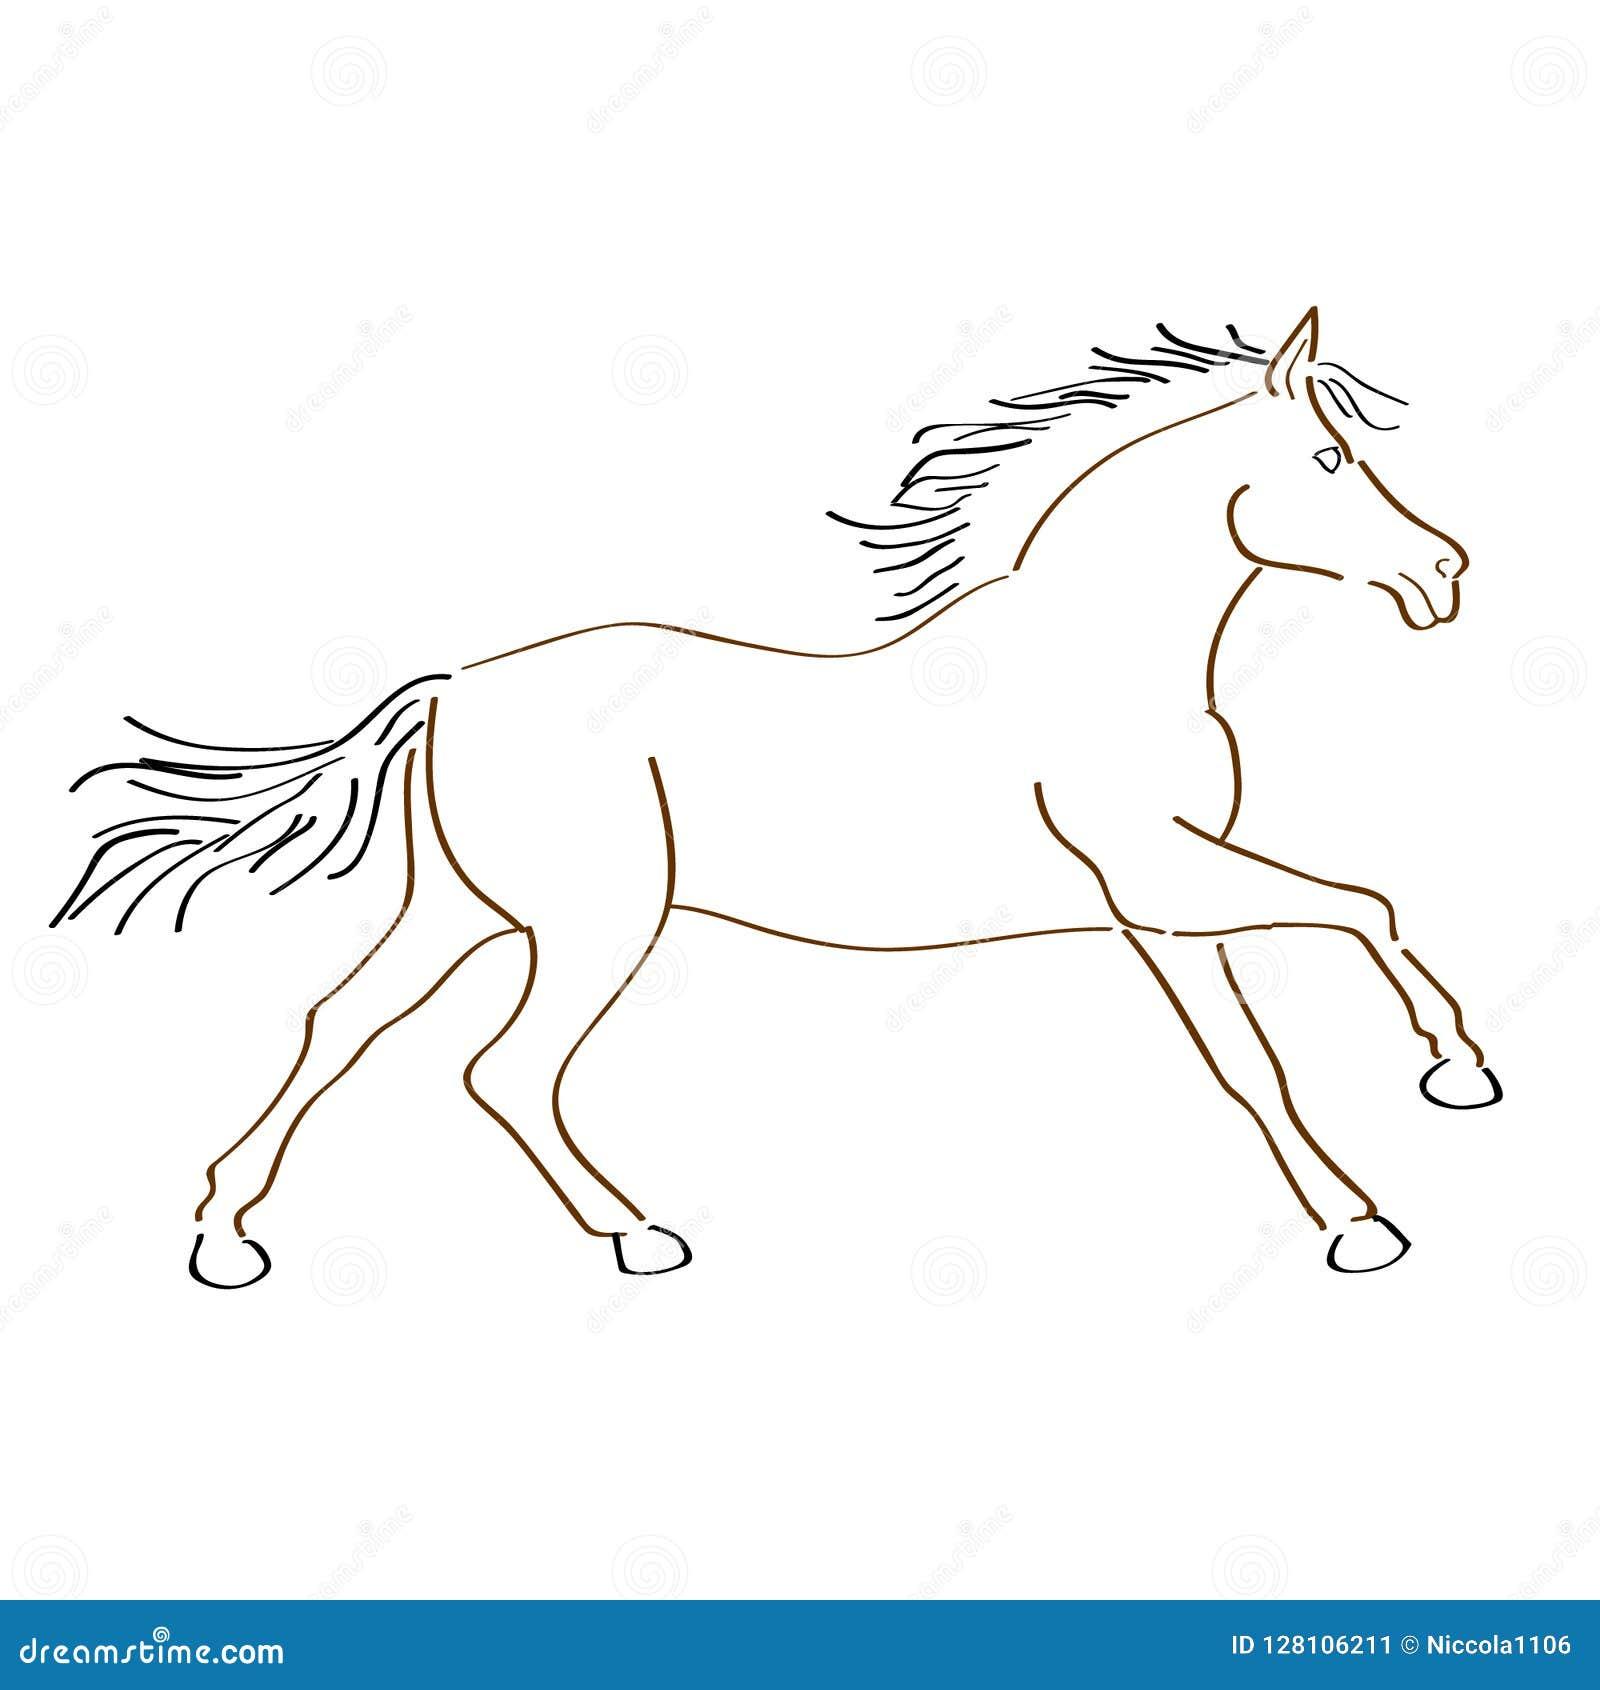 Art Handmade Drawing Horse Stock Vector Illustration Of Silhouette 128106211